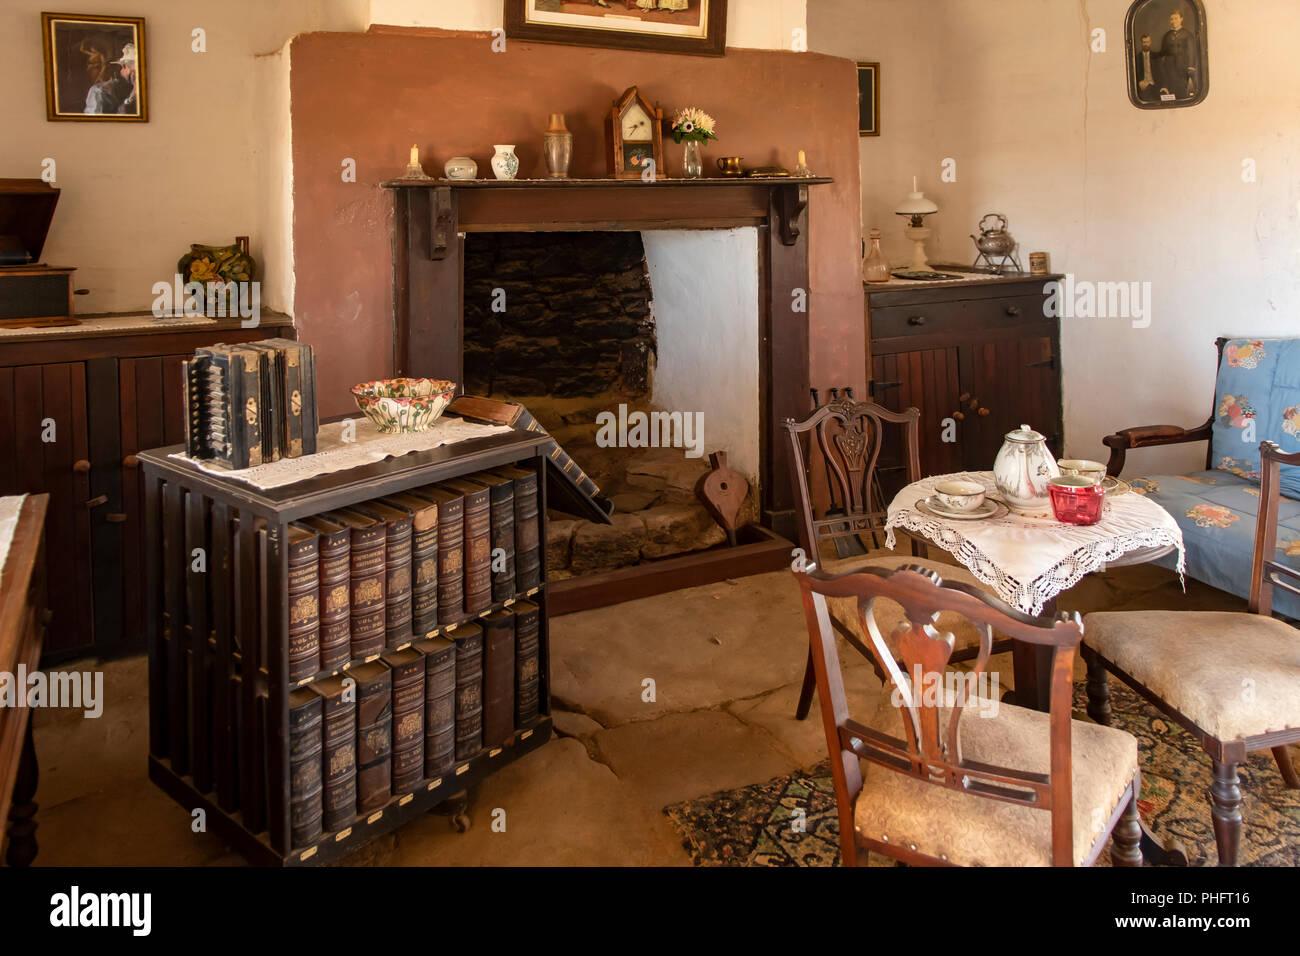 Inside Mangowine Homestead, Nungarin, WA, Australia - Stock Image